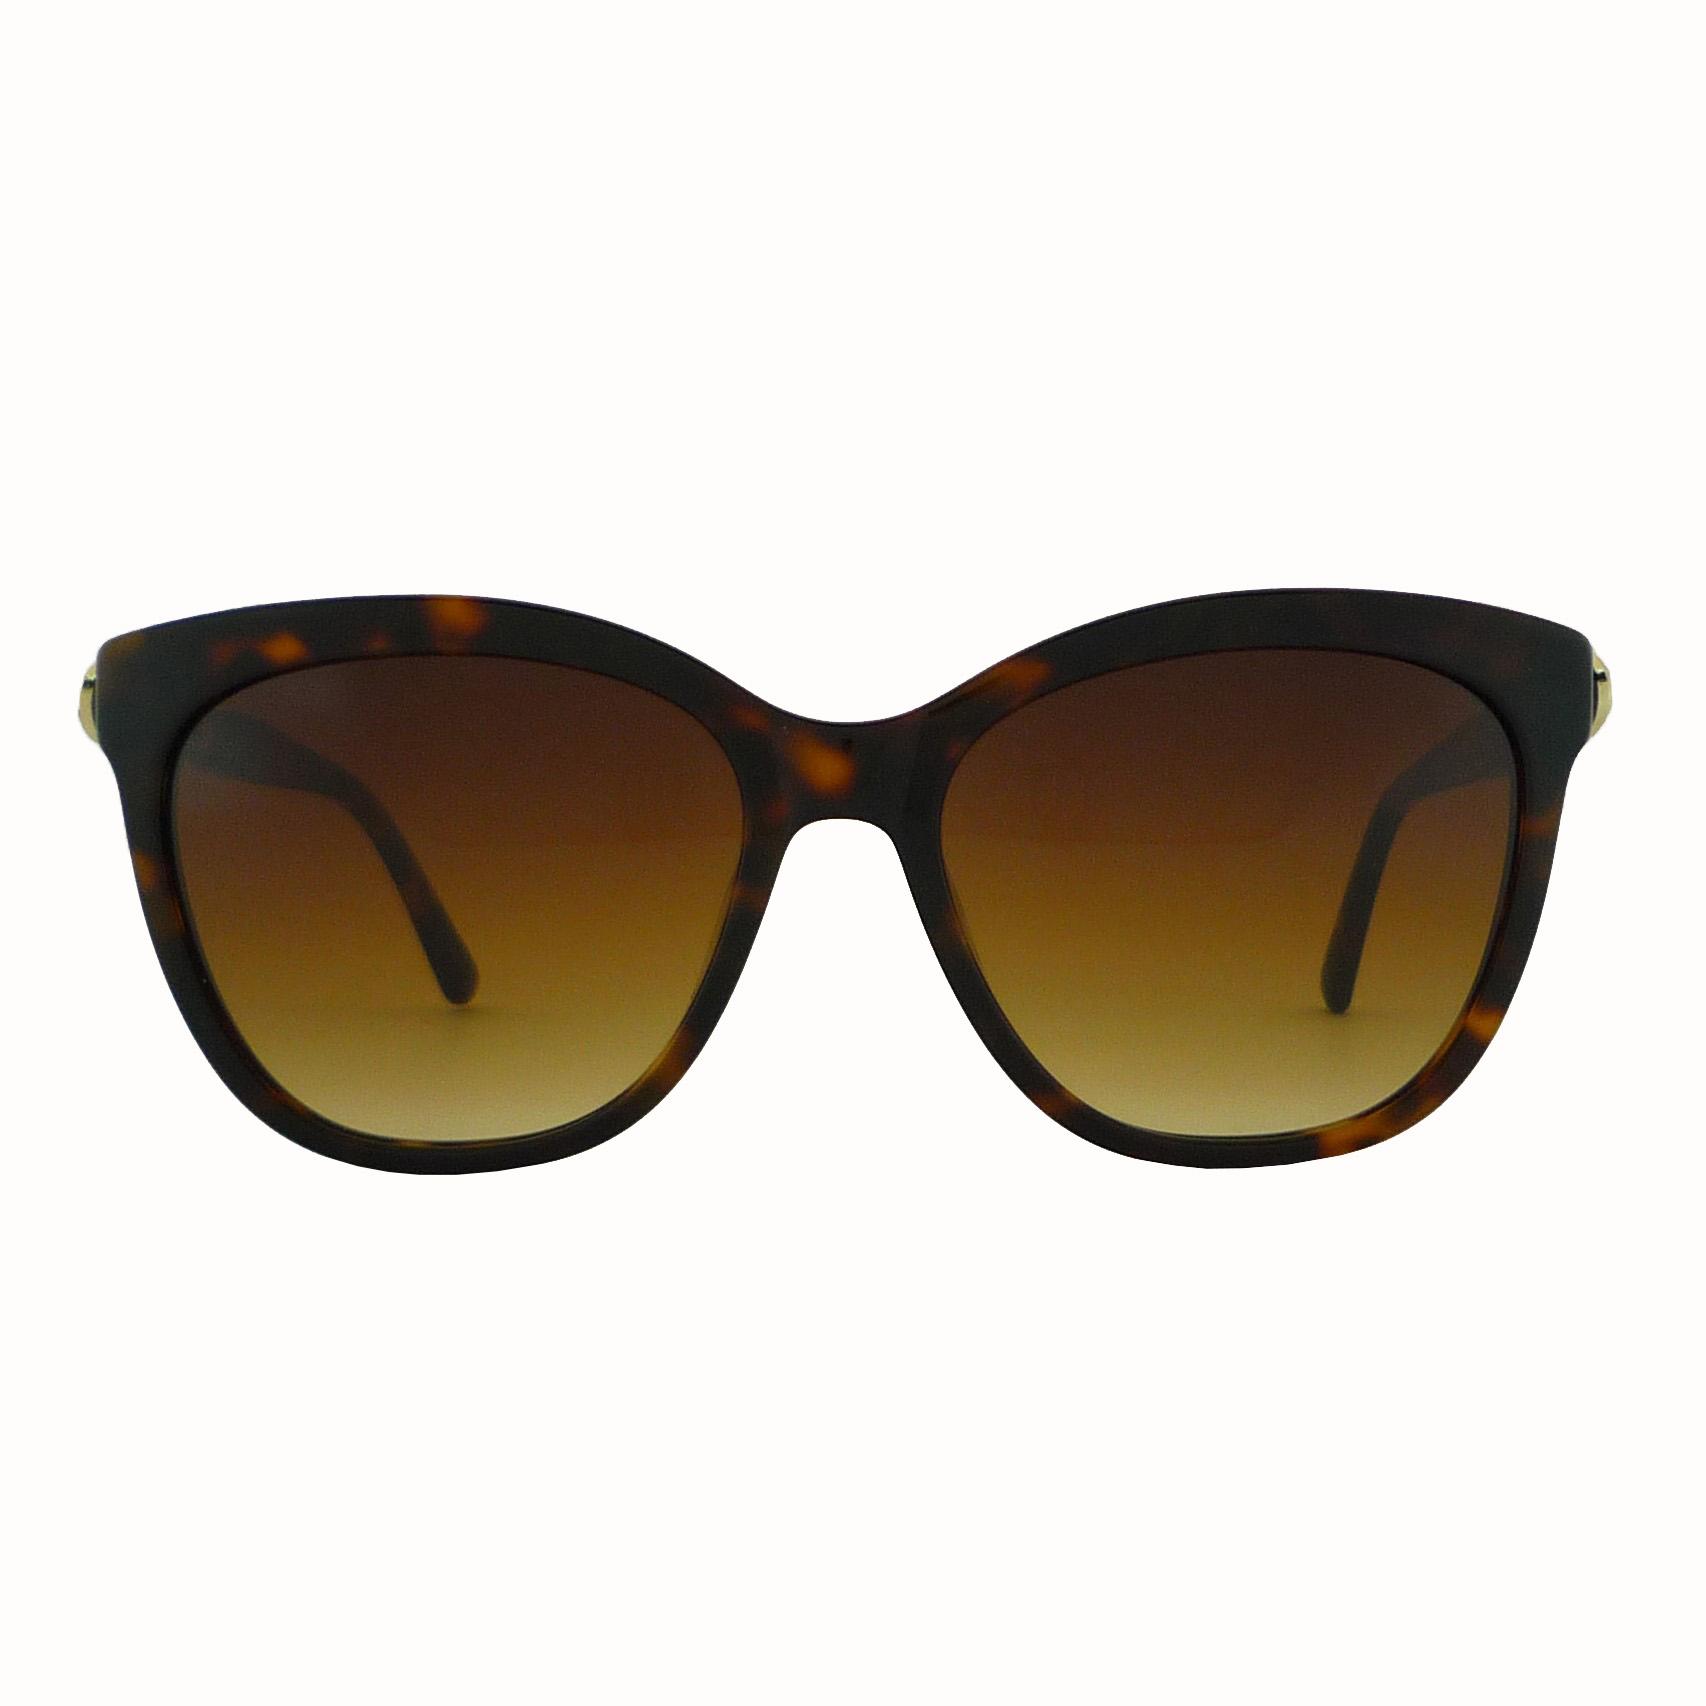 عینک آفتابی بولگاری مدل BV8328-HW08